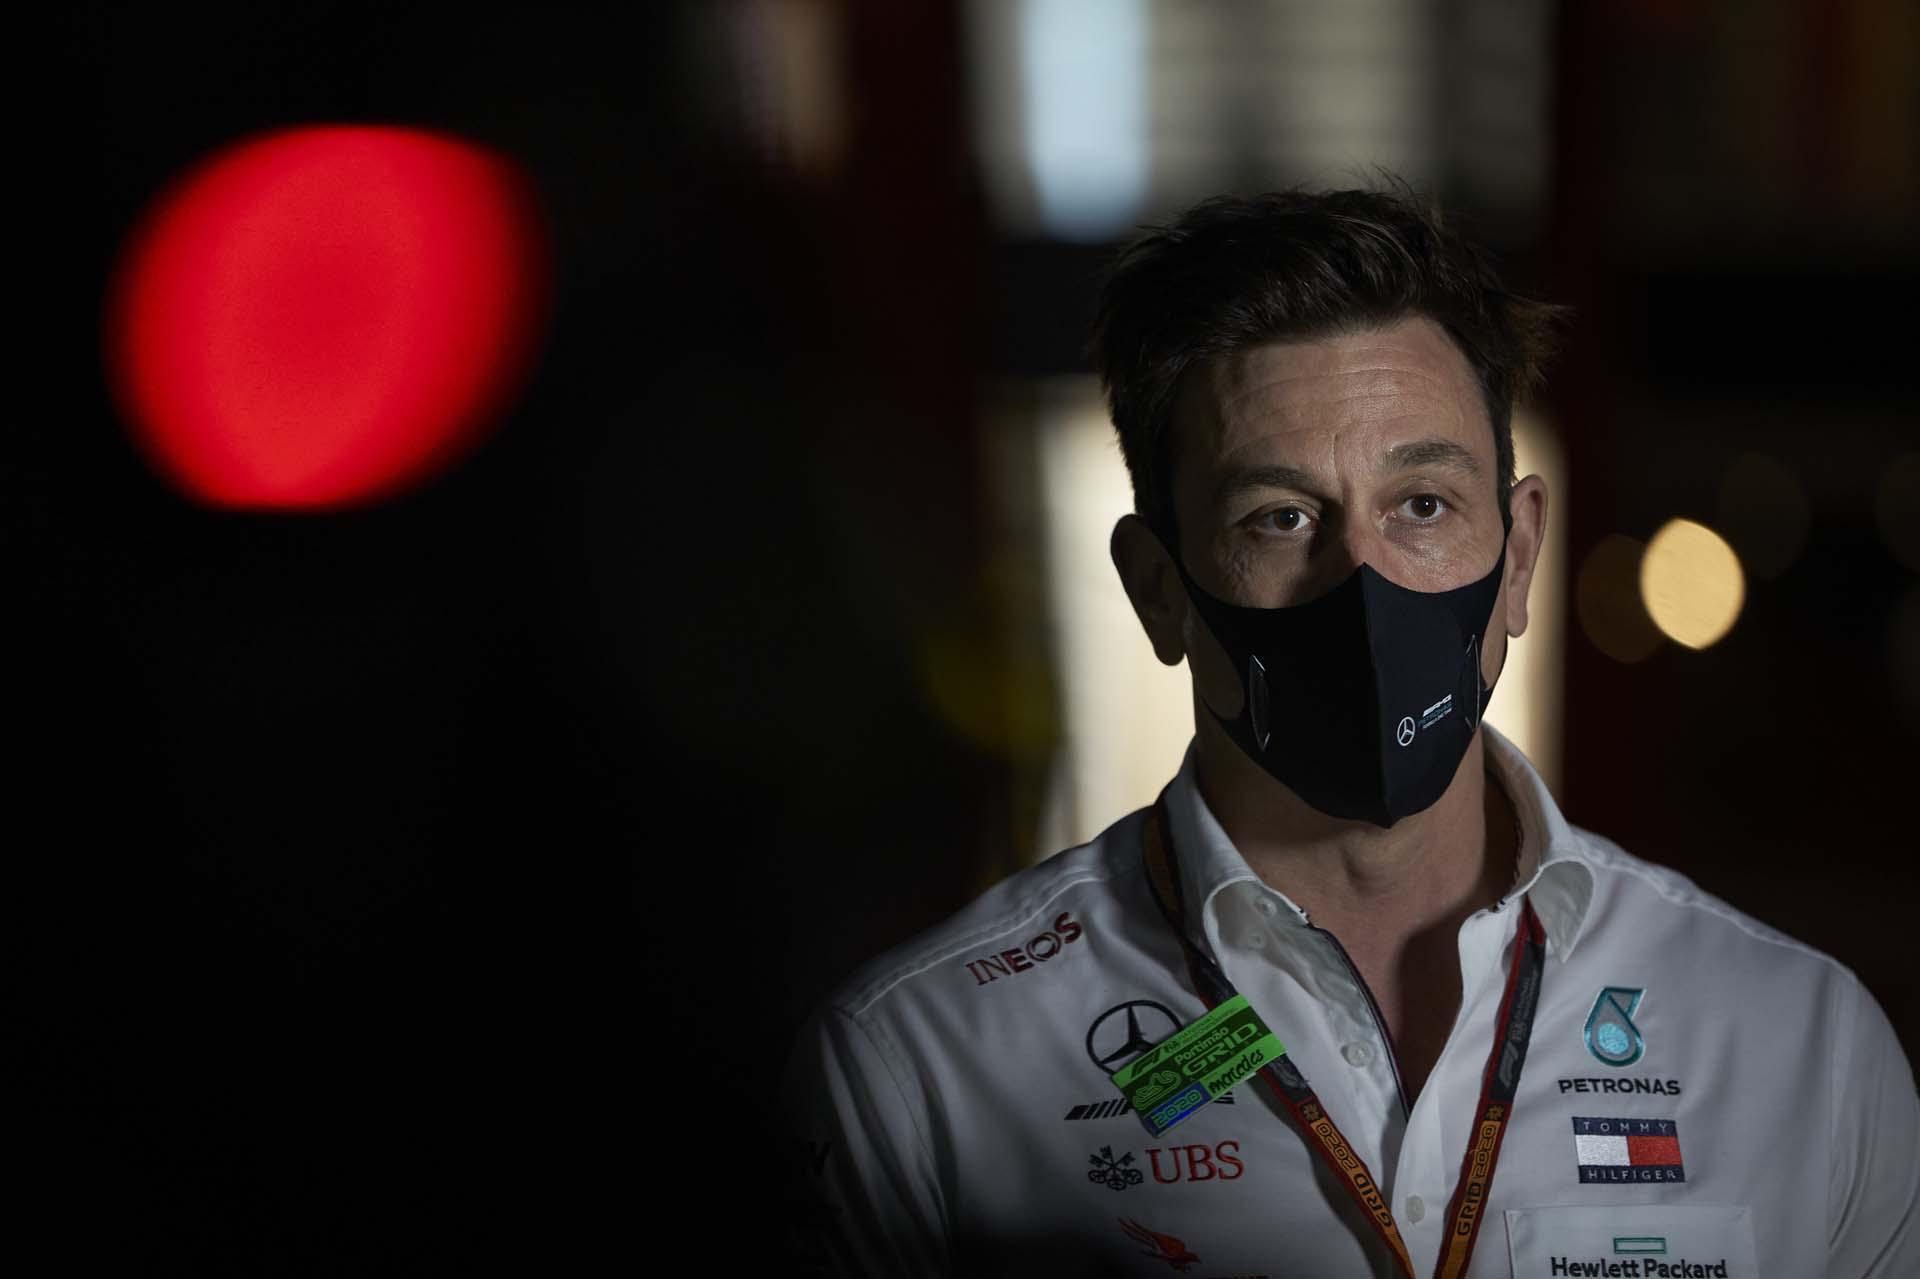 2020 Emilia Romagna Grand Prix, Friday - Steve Etherington